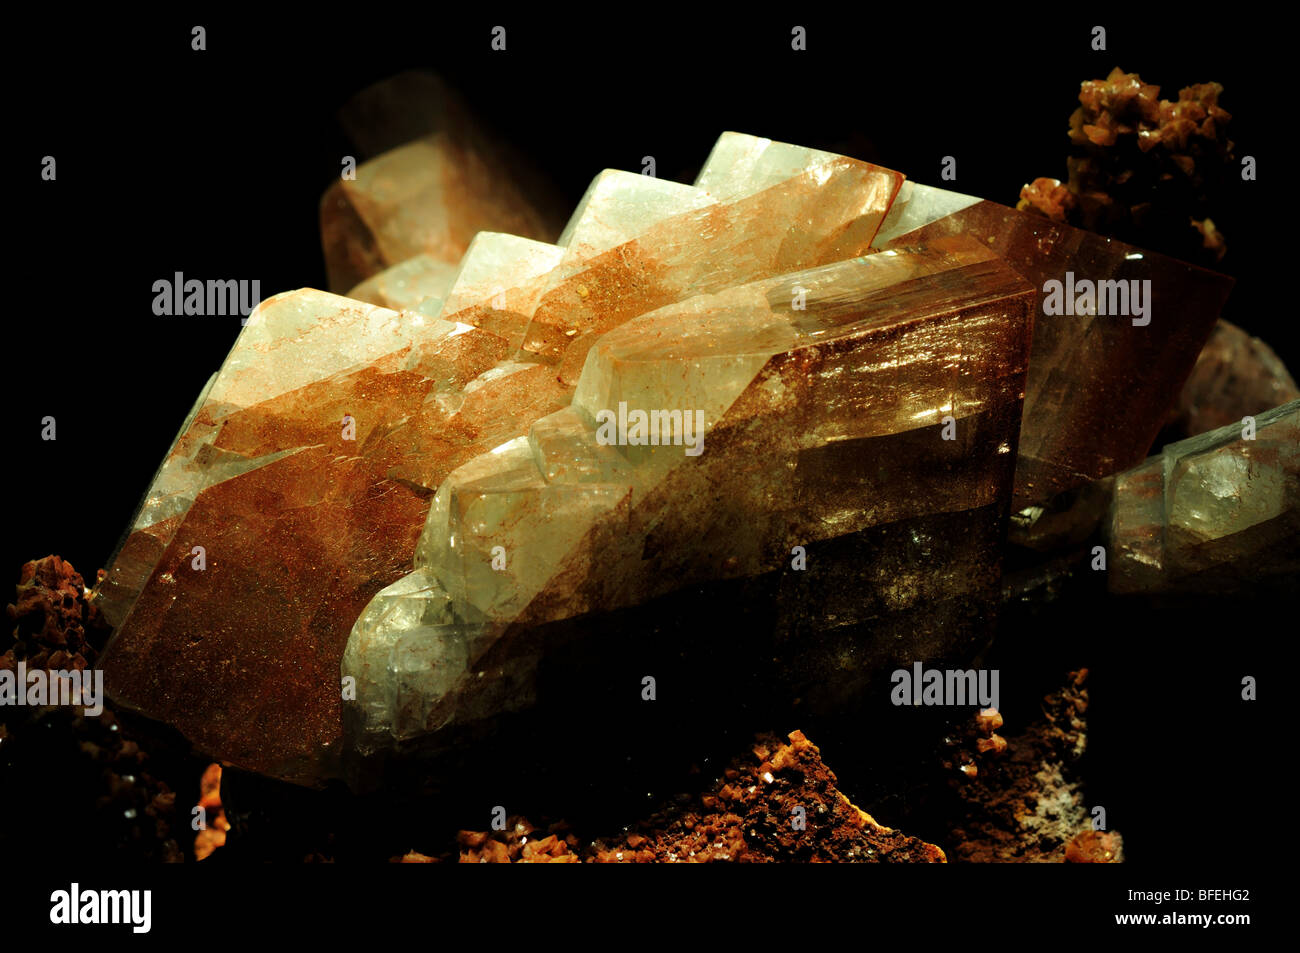 Barite (baryte) crystals, barium sulfate BaSO4. - Stock Image